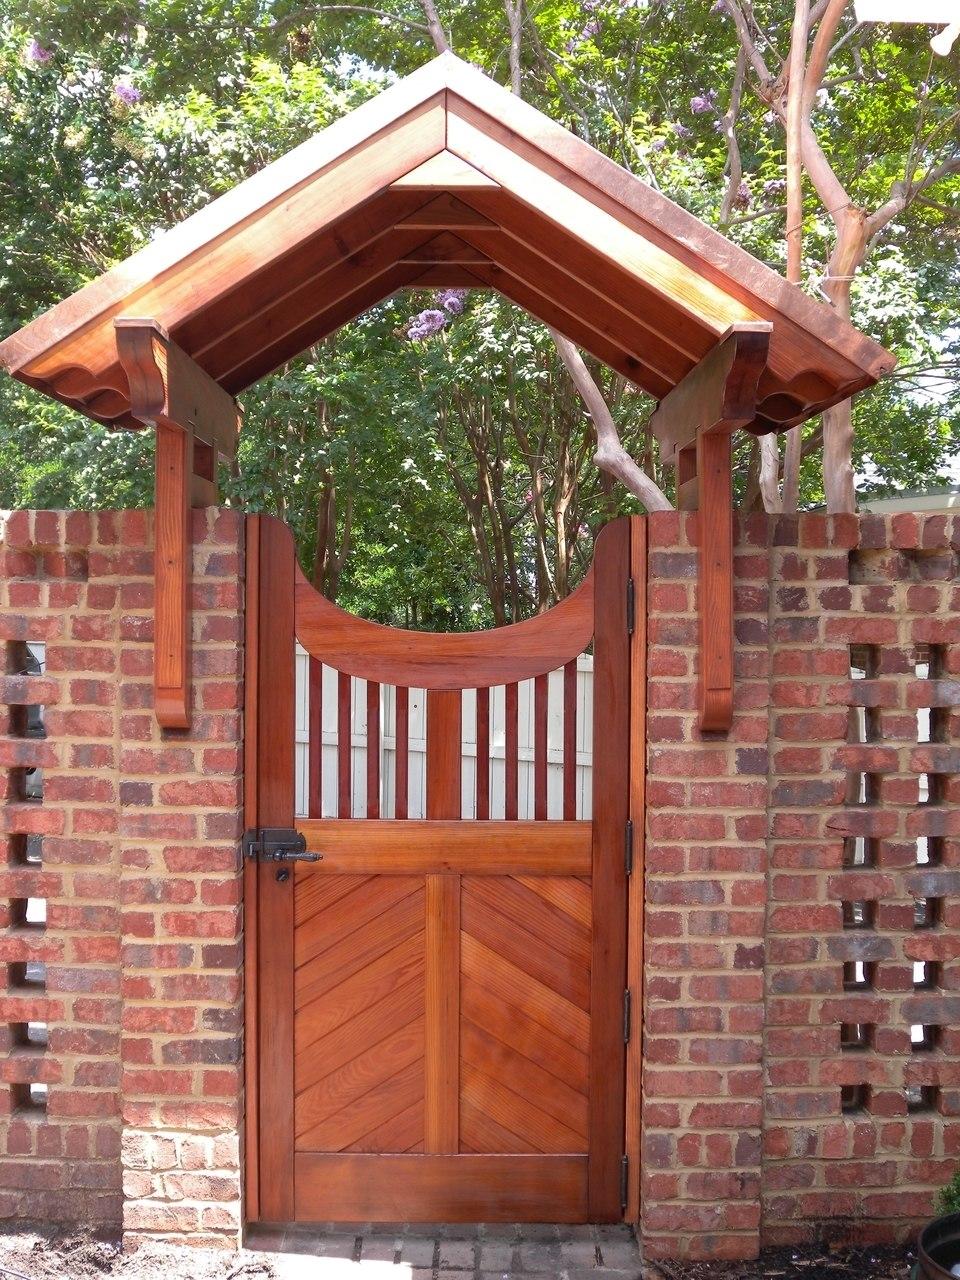 Heavy Duty Coastal Bronze Gate Hinges 30 401 With Ornate Gate Latch 60 350